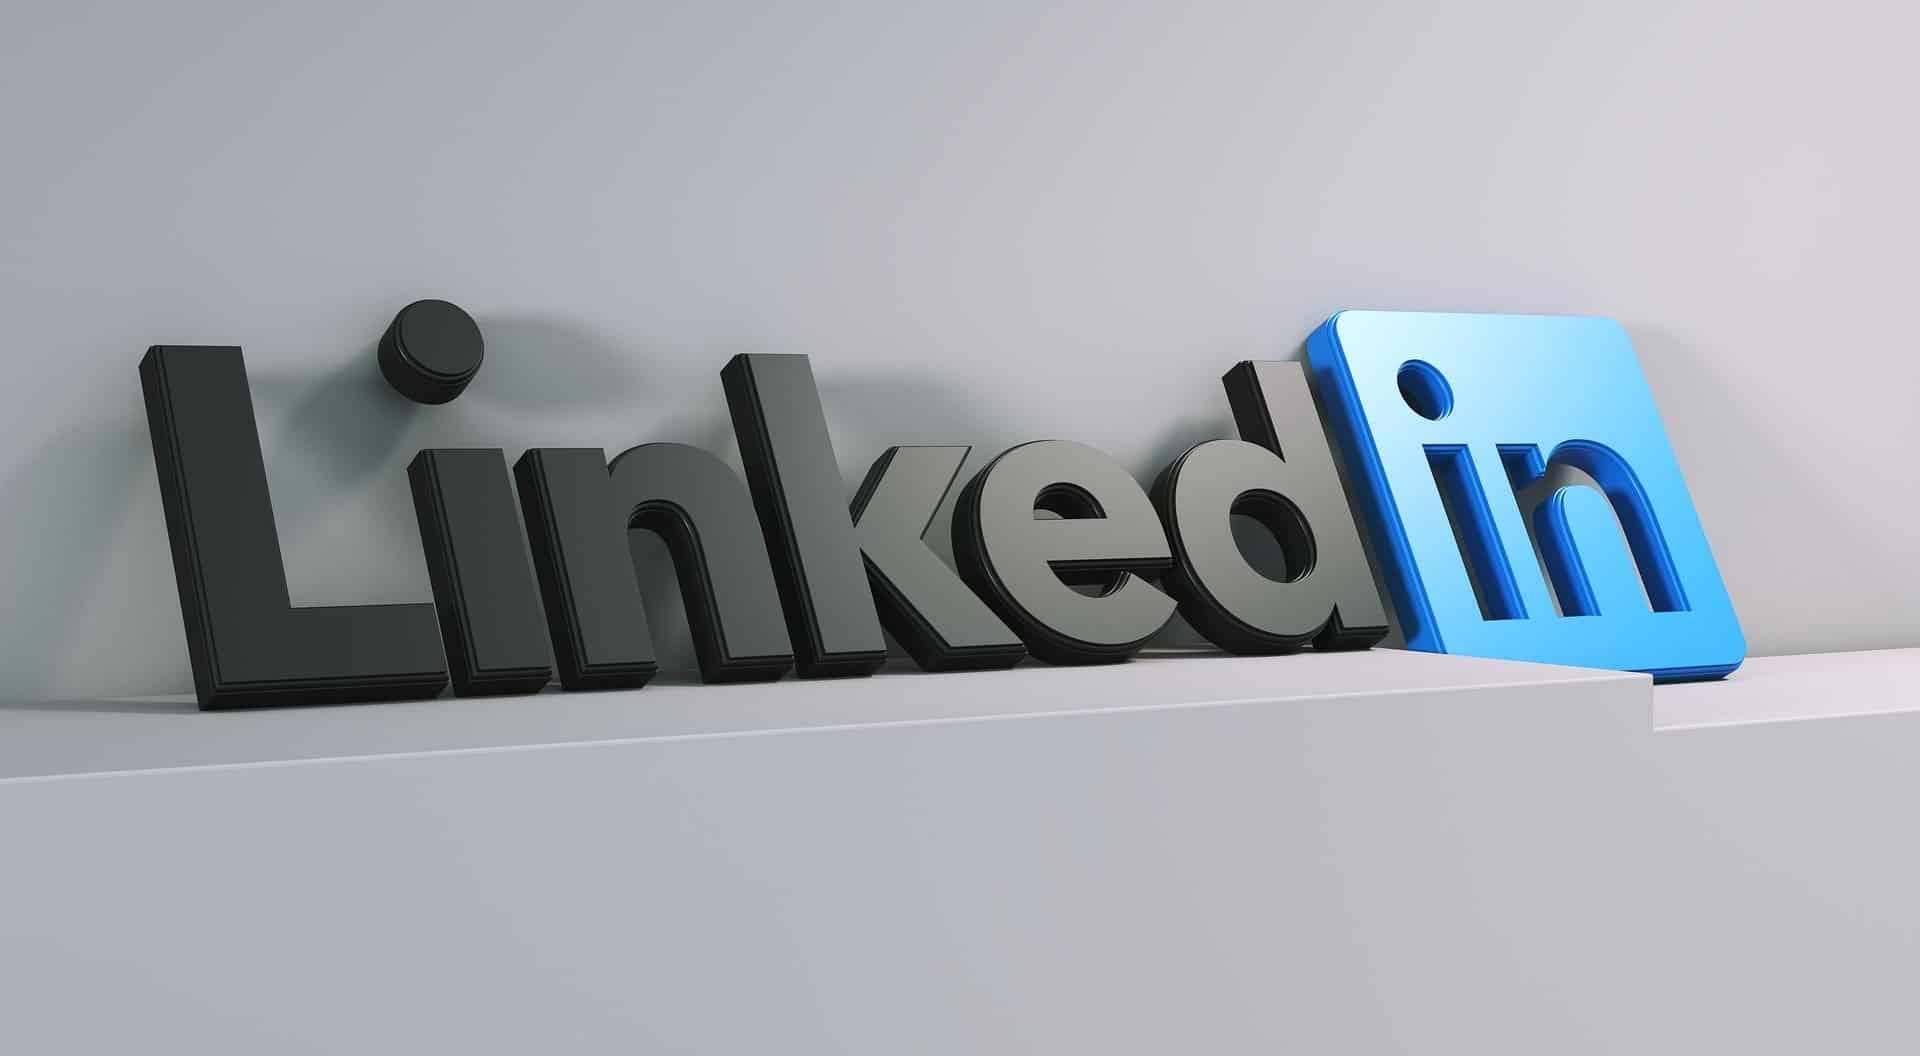 LinkedIn Marketing Hacks to Grow Your Business